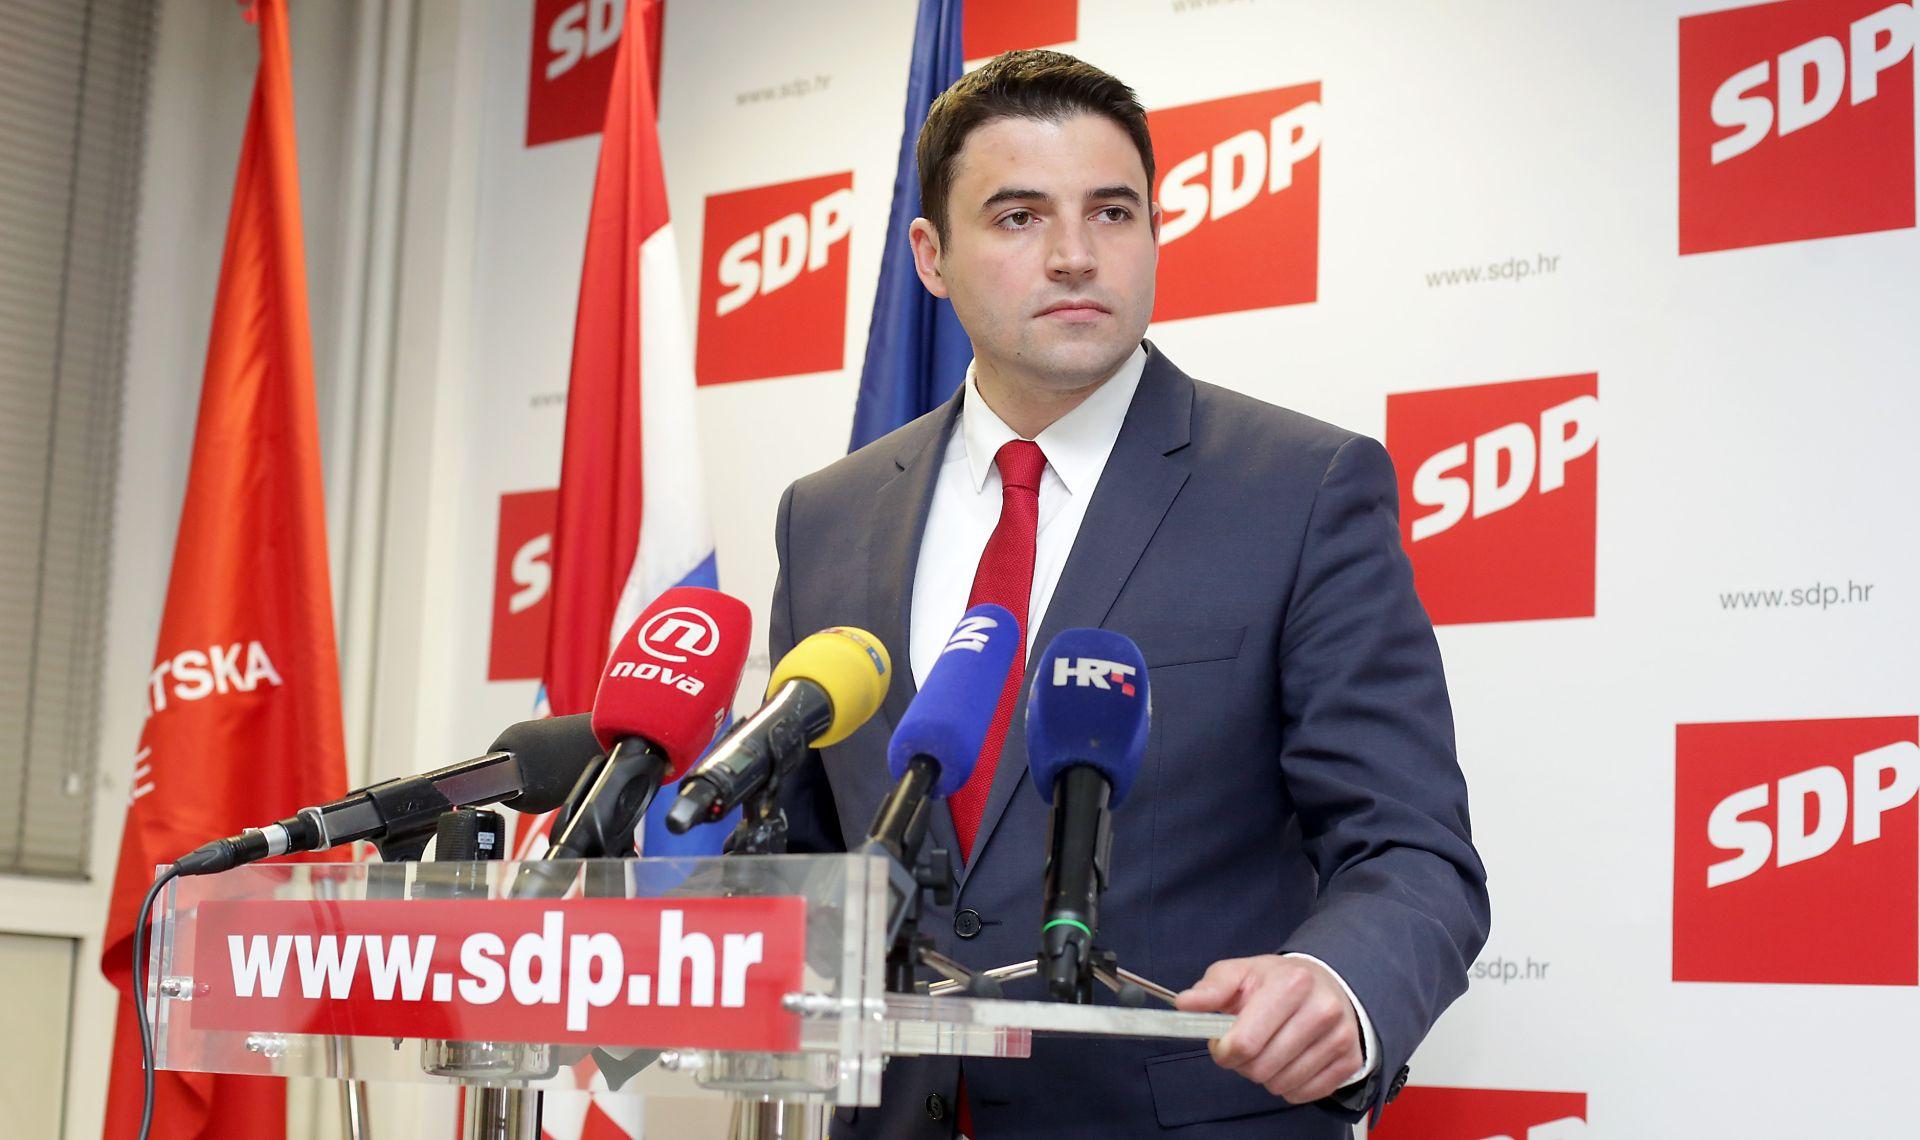 DAVOR BERNARDIĆ: 'SDP očekuje nacionalni dogovor s HNS-om'